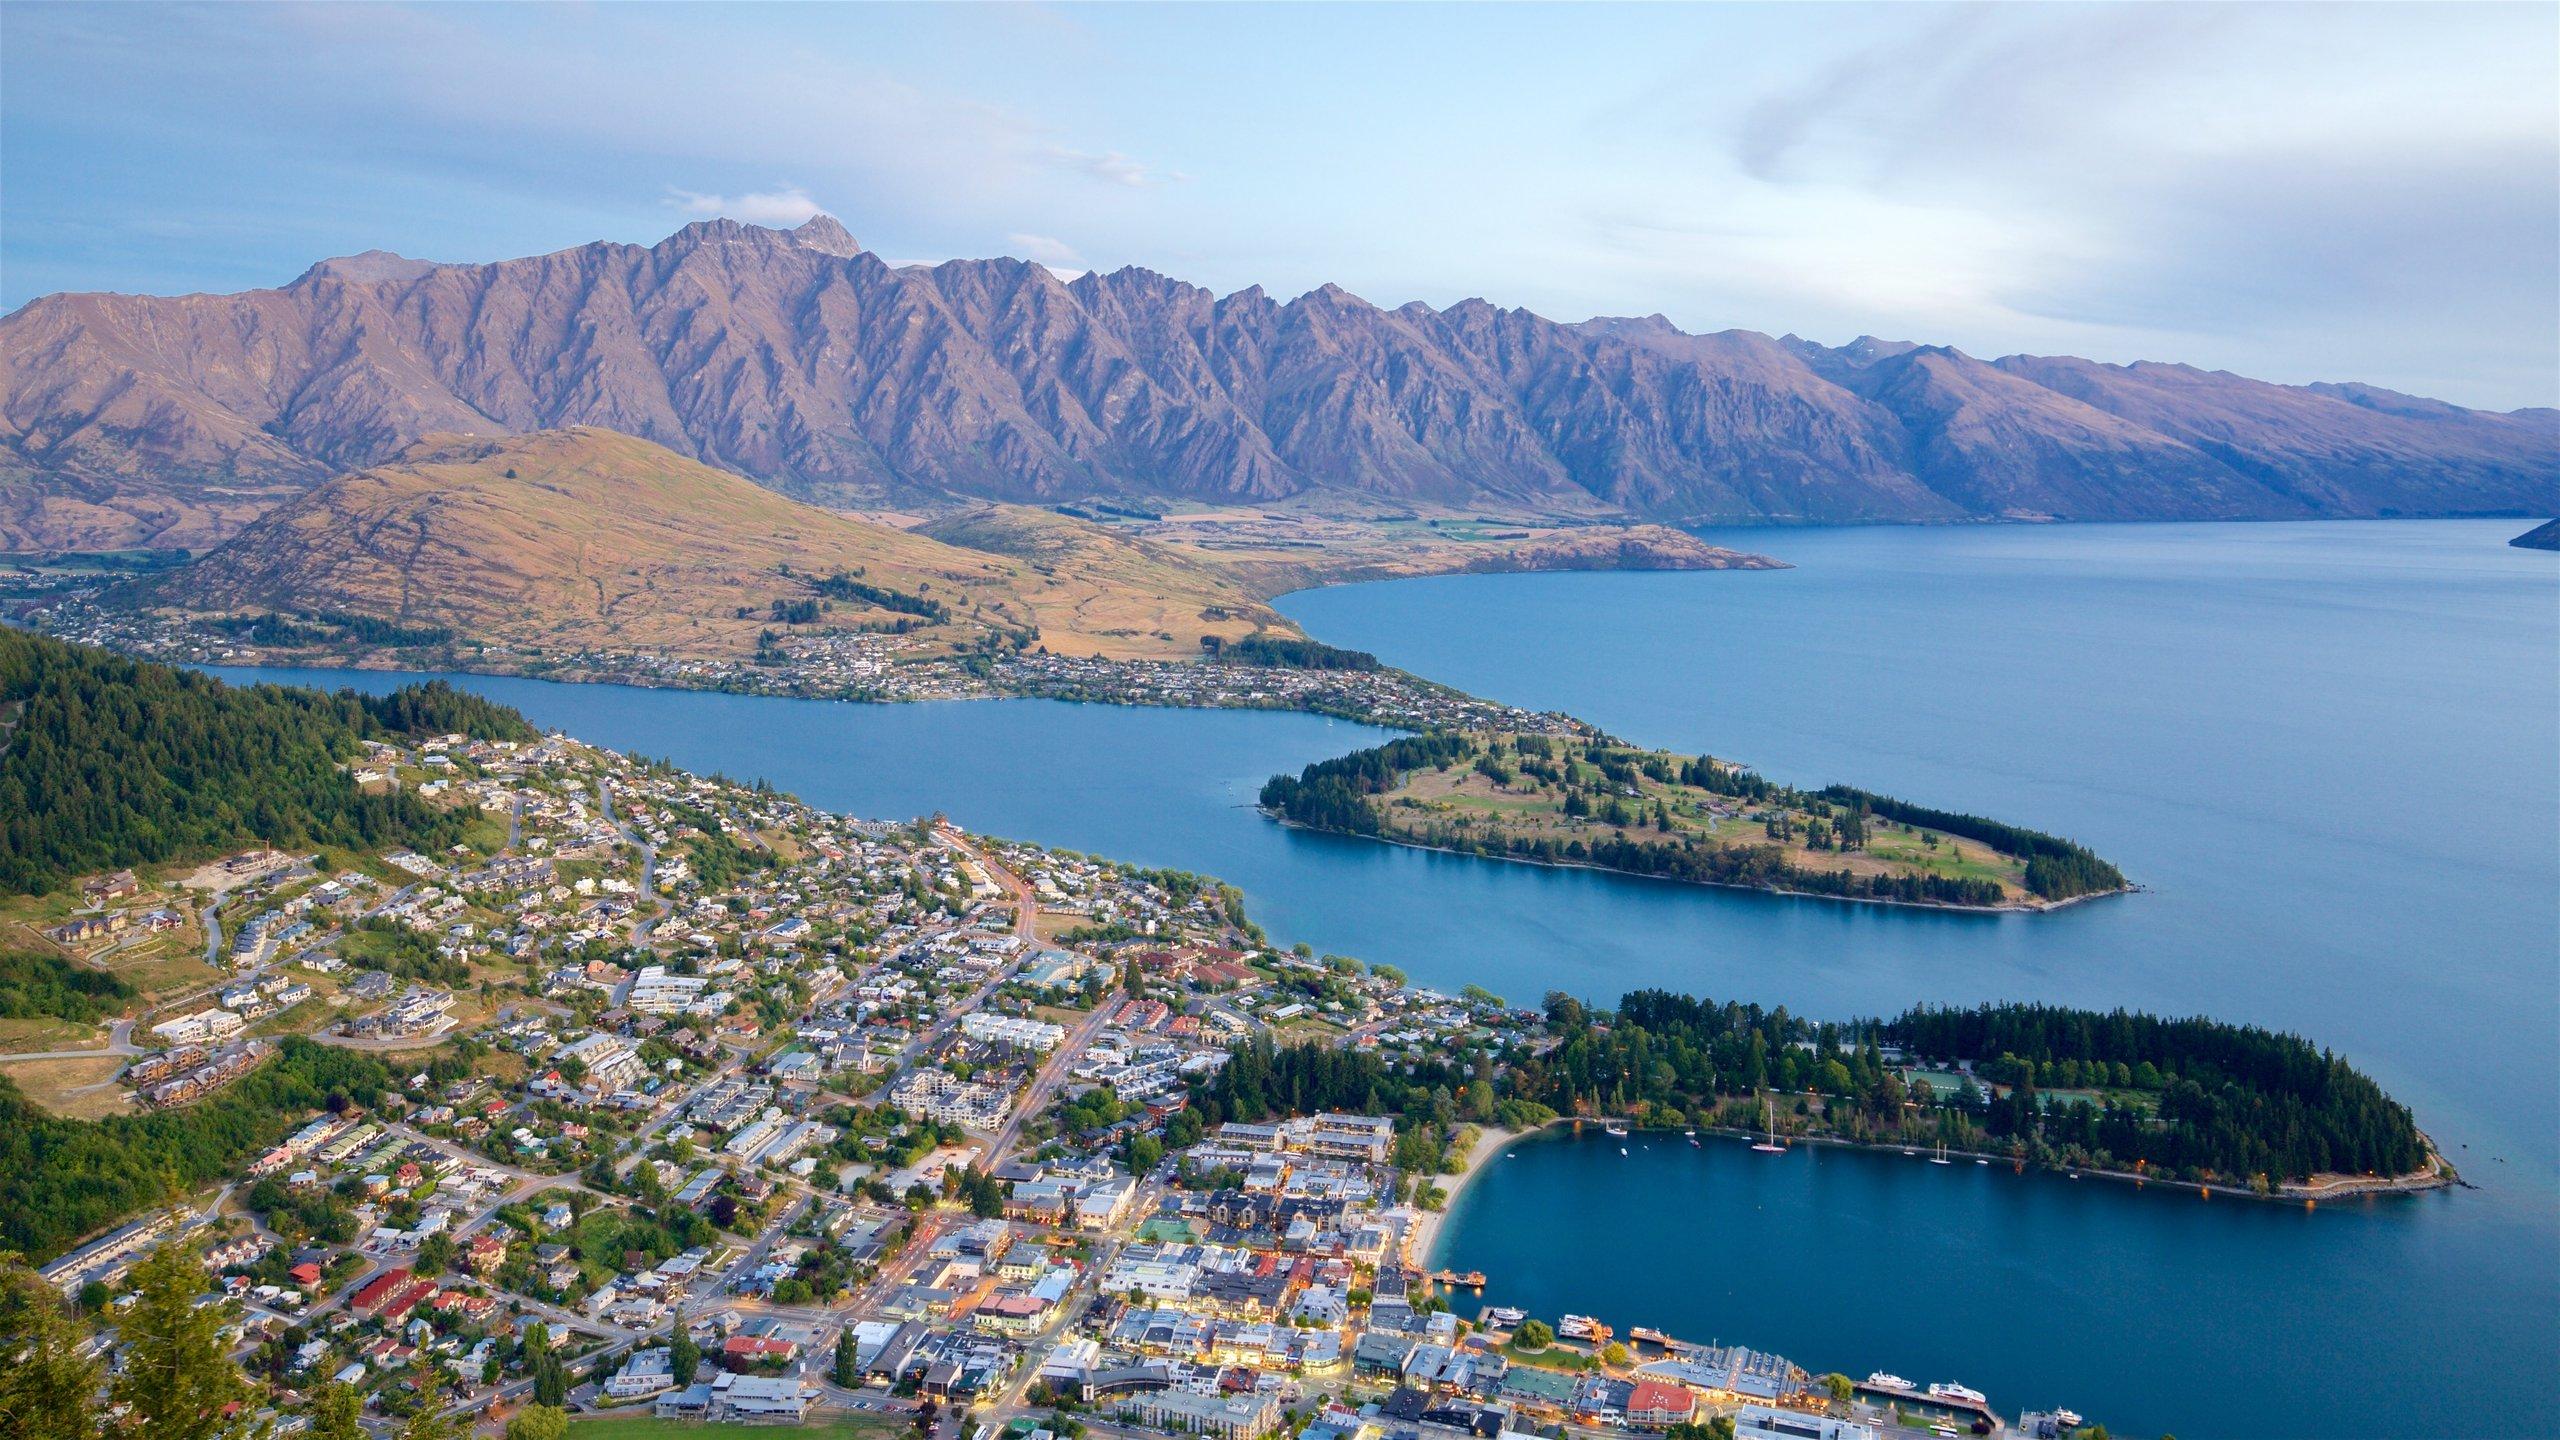 Otago, New Zealand